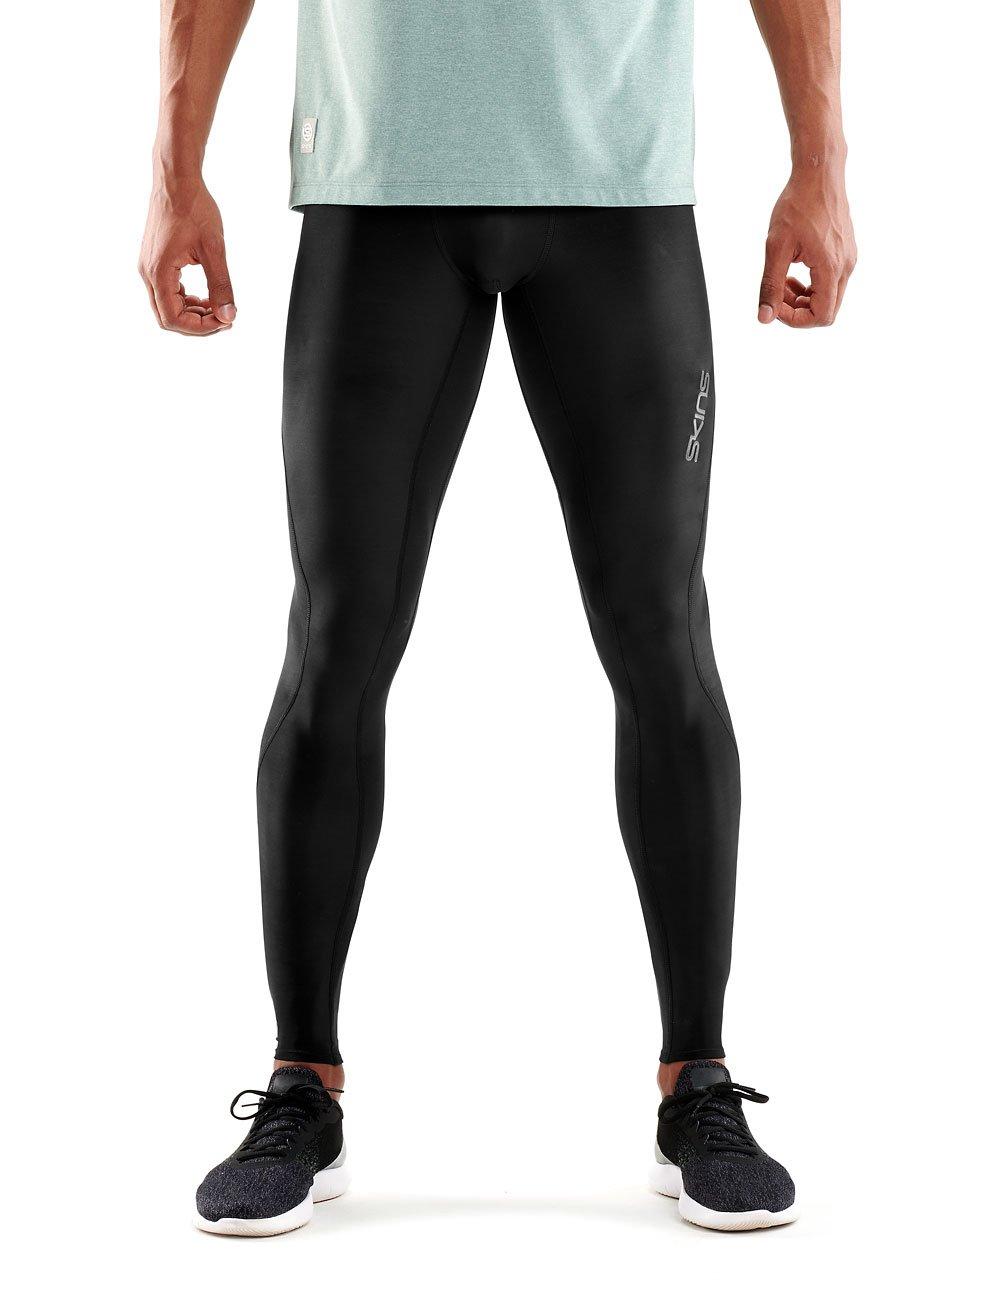 SKINS Men's DNAmic Compression Long Tights Skins North America DA99050019-P